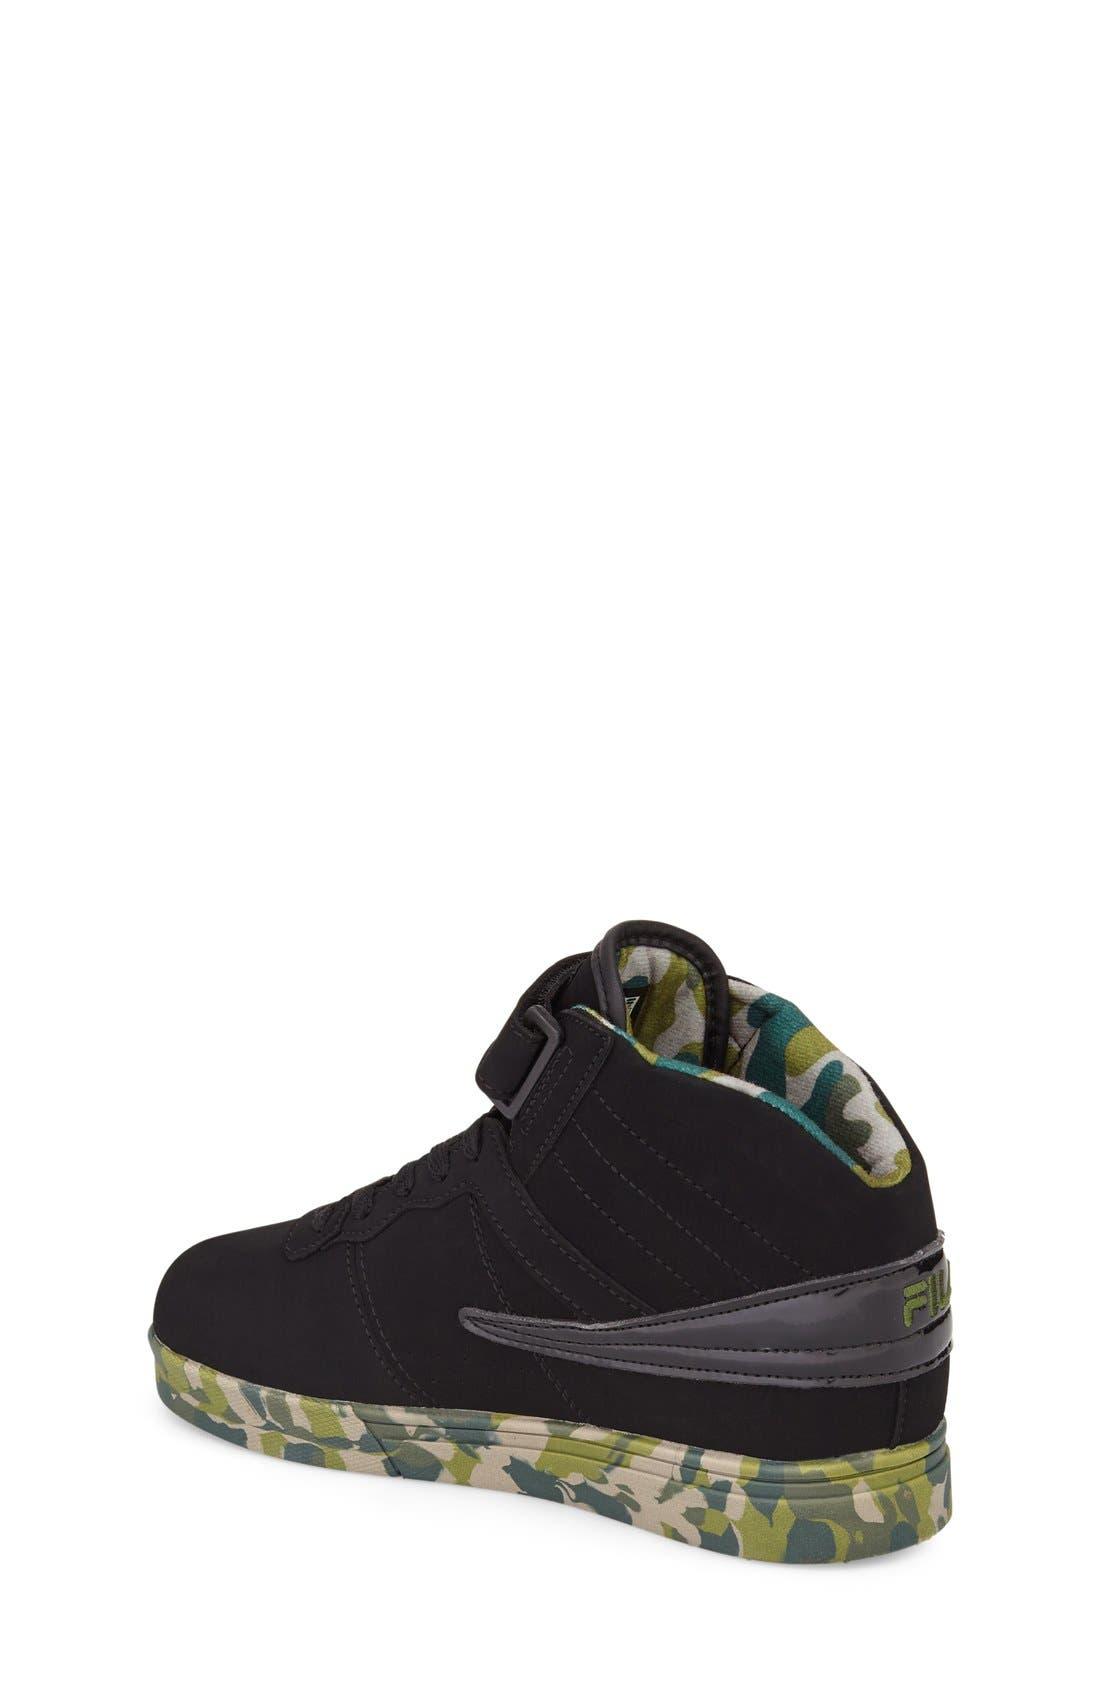 Vulc 13 Mashup High Top Sneaker,                             Alternate thumbnail 2, color,                             001